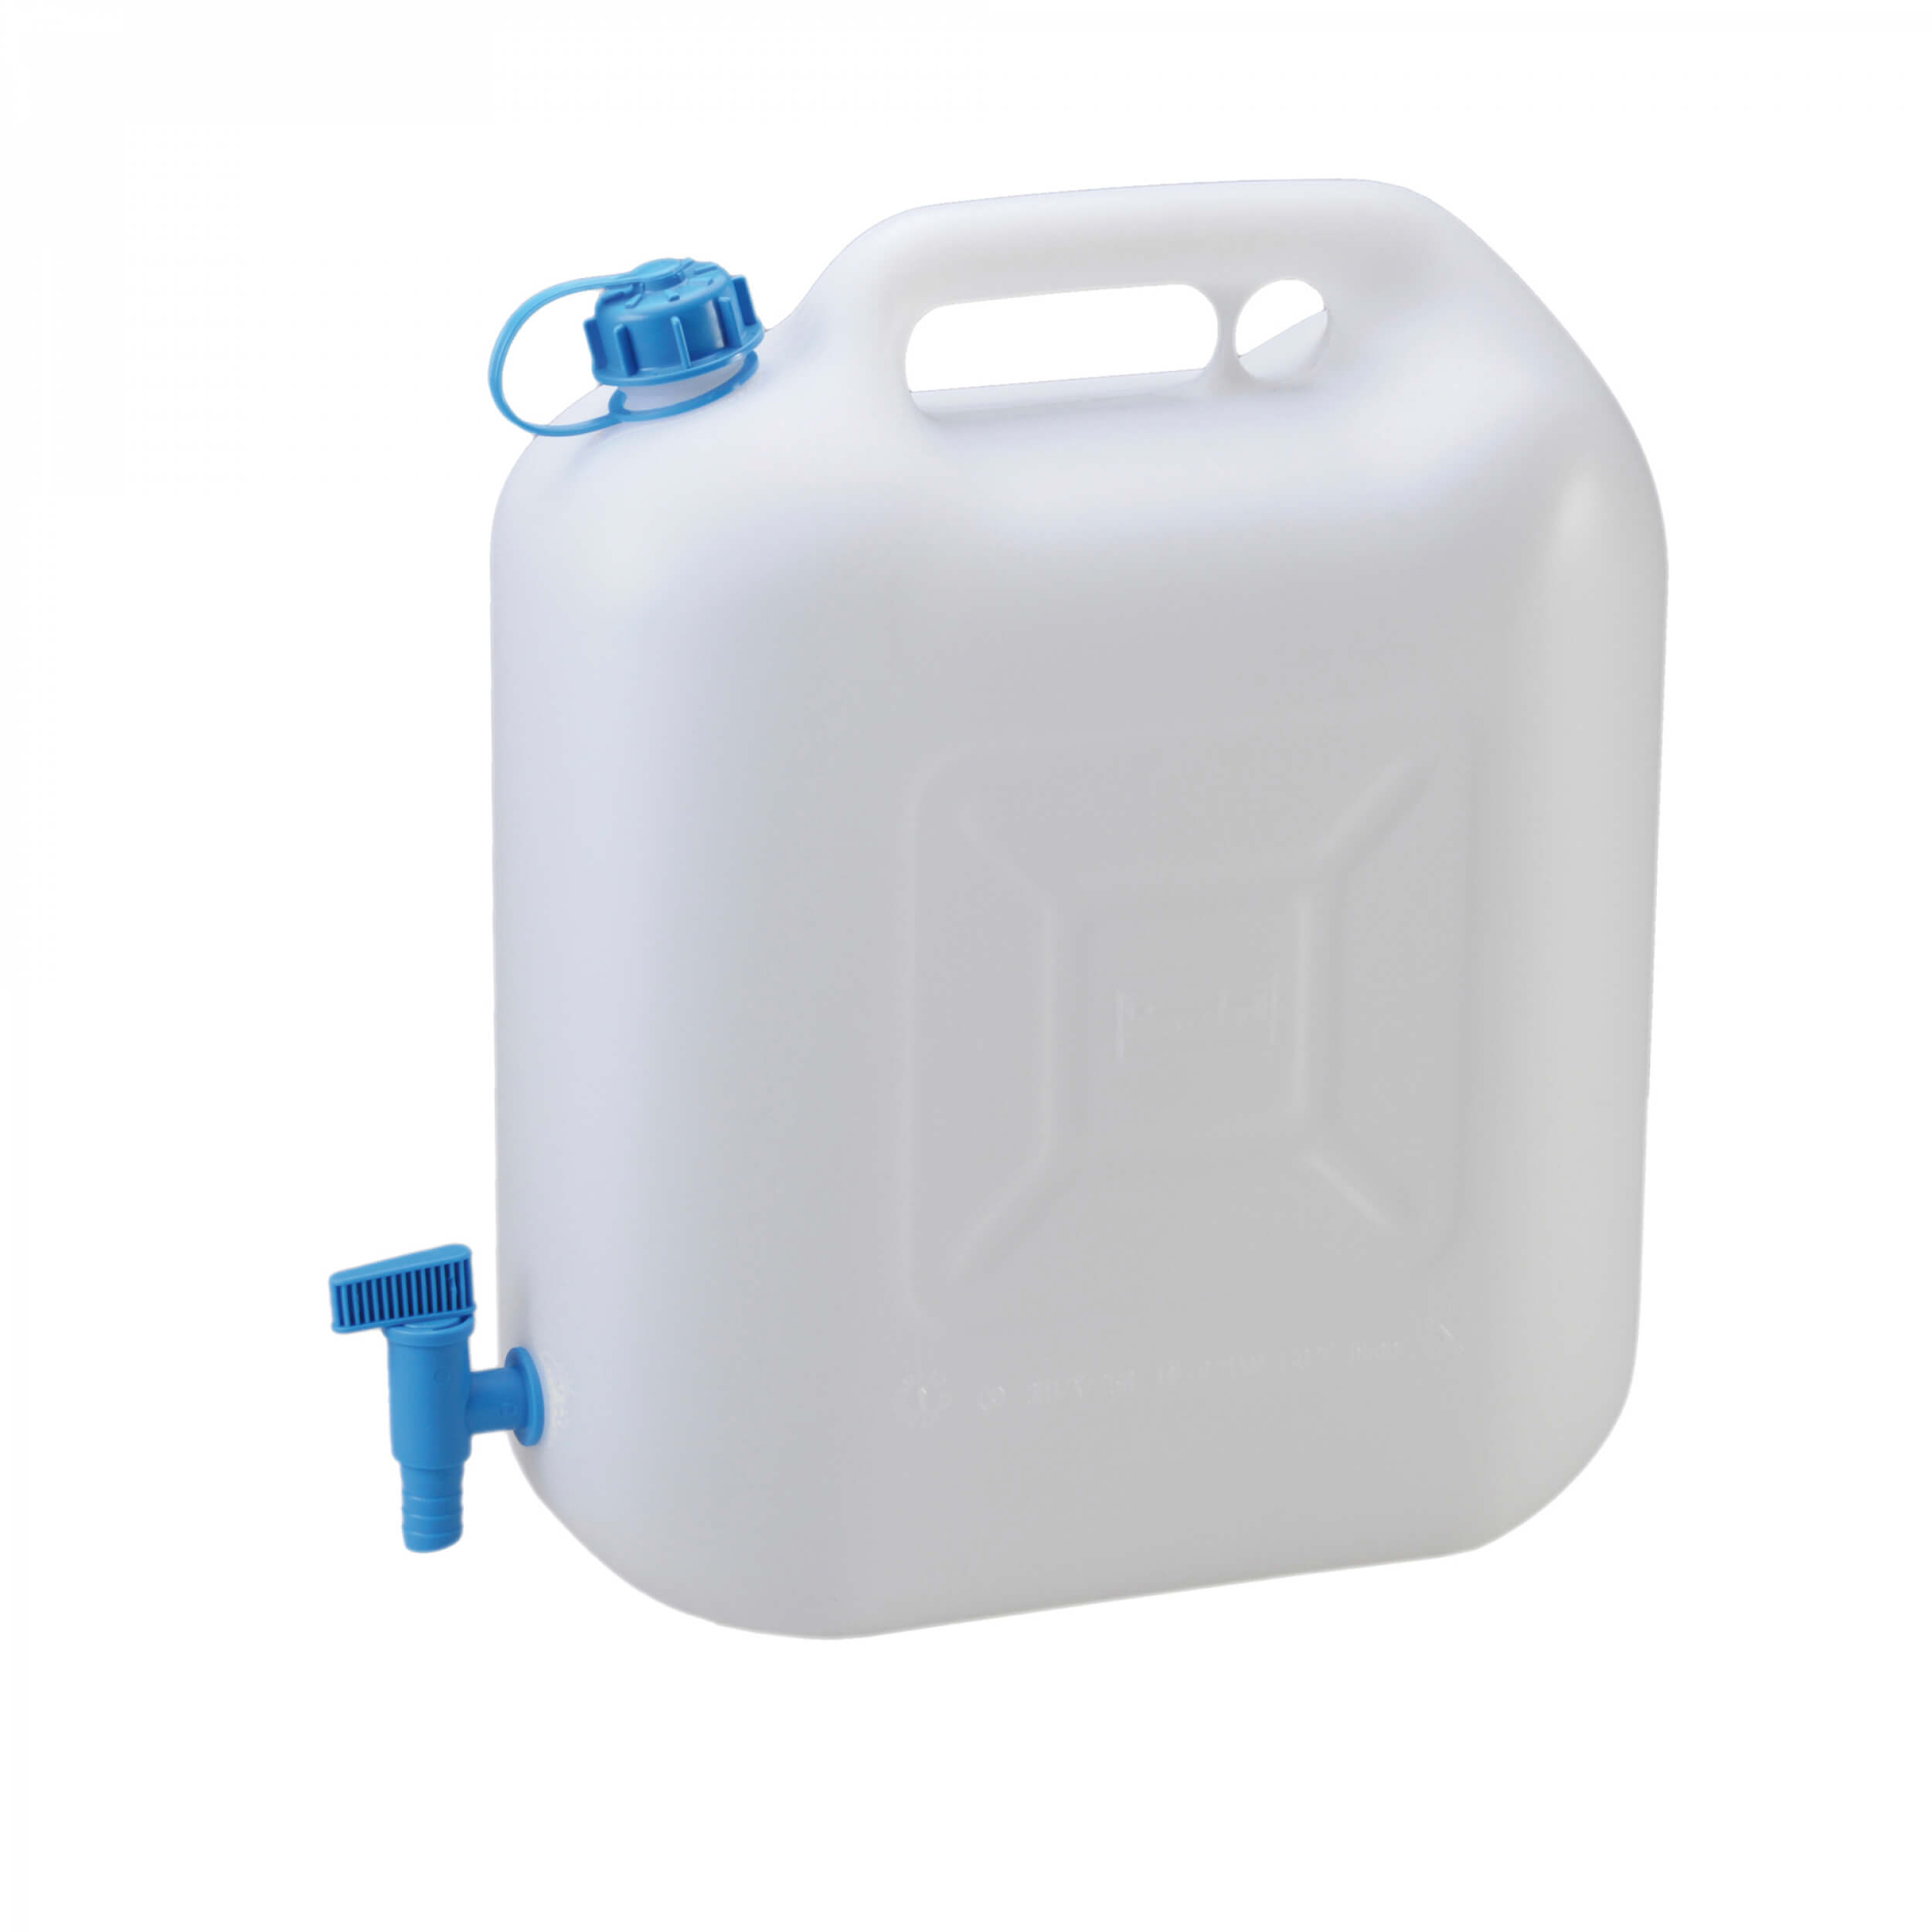 Hünersdorff Wasserkanister Eco